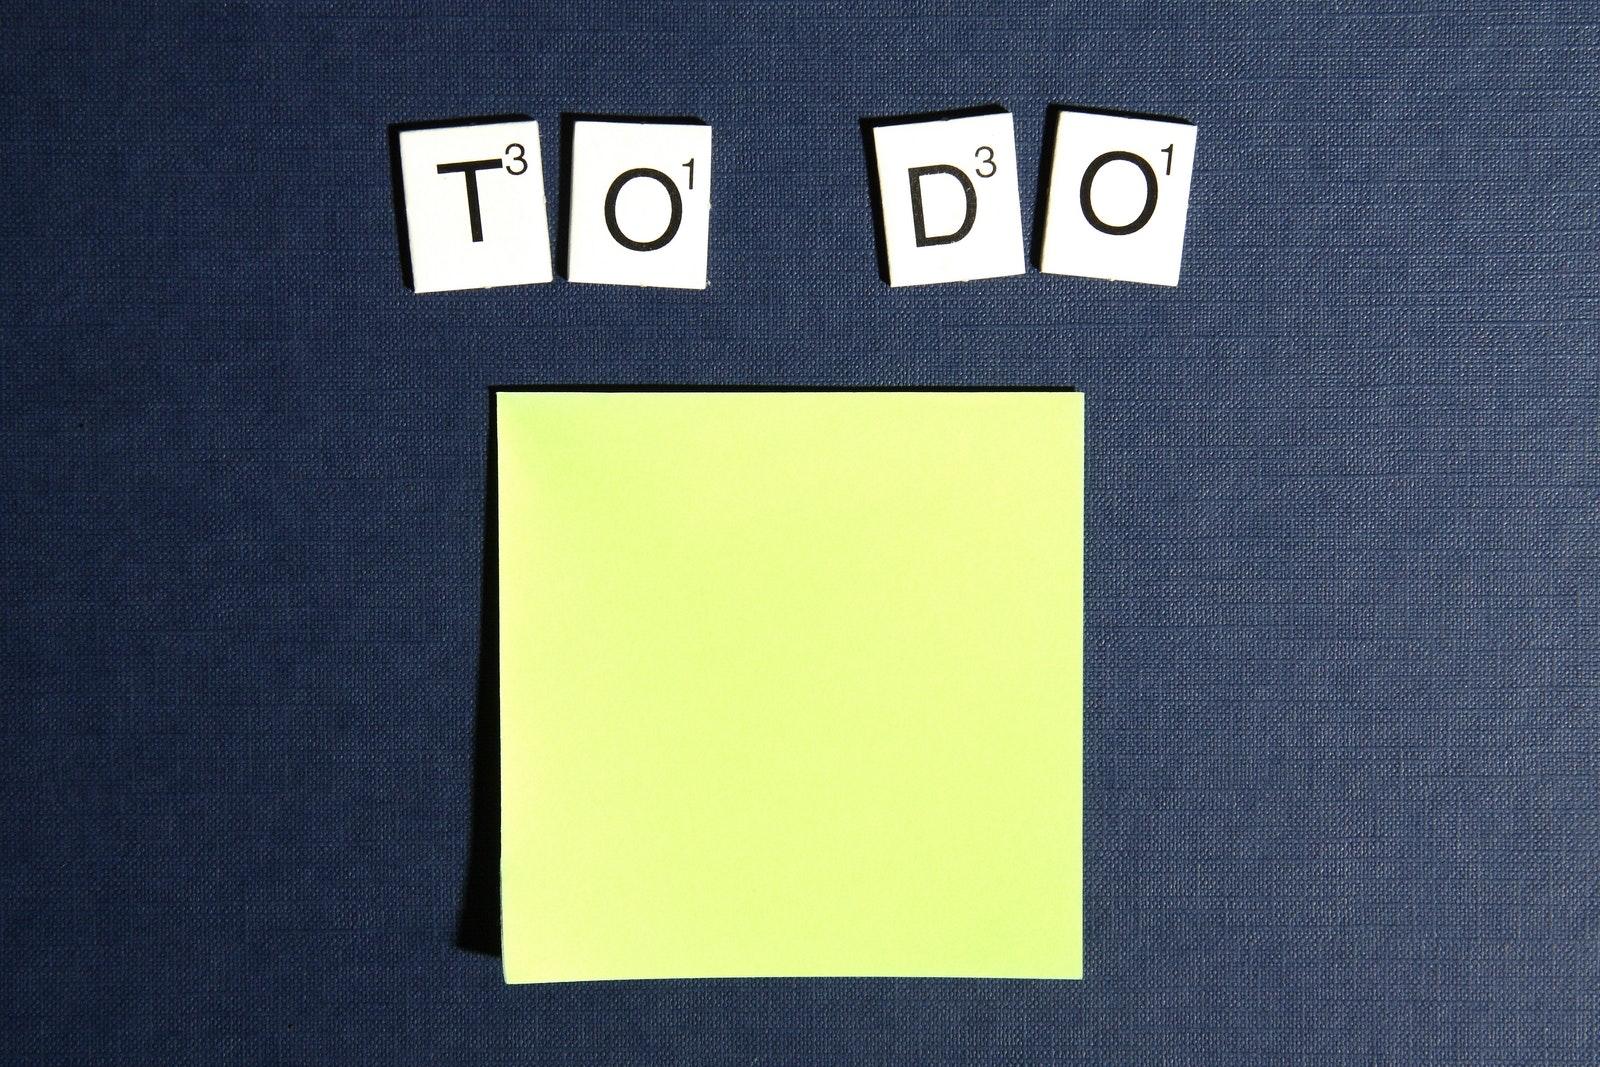 agenda-blank-checklist-3299.jpg